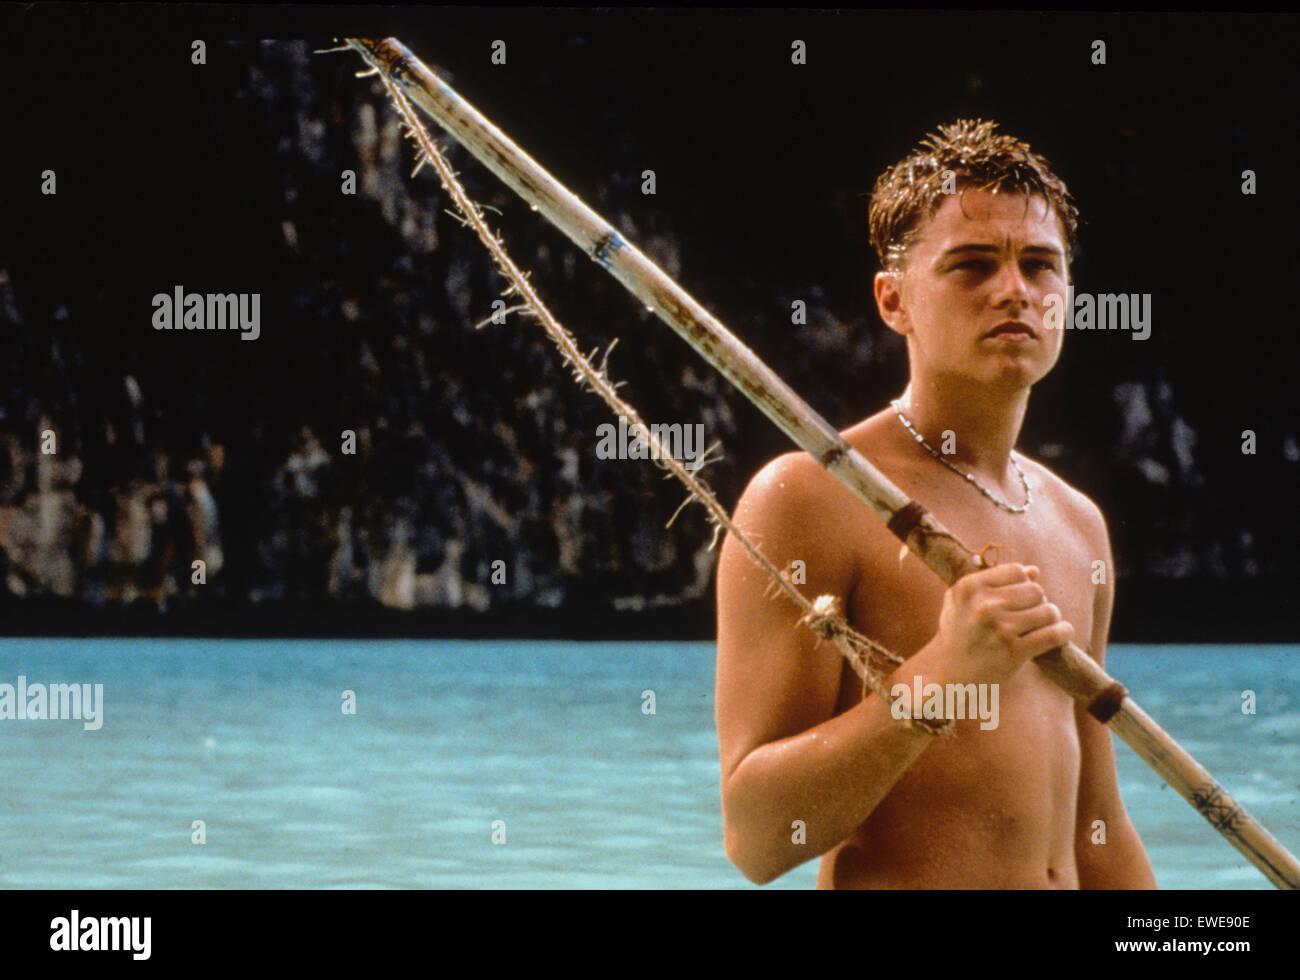 leonardo di caprio, The Beach, 2000 - Stock Image